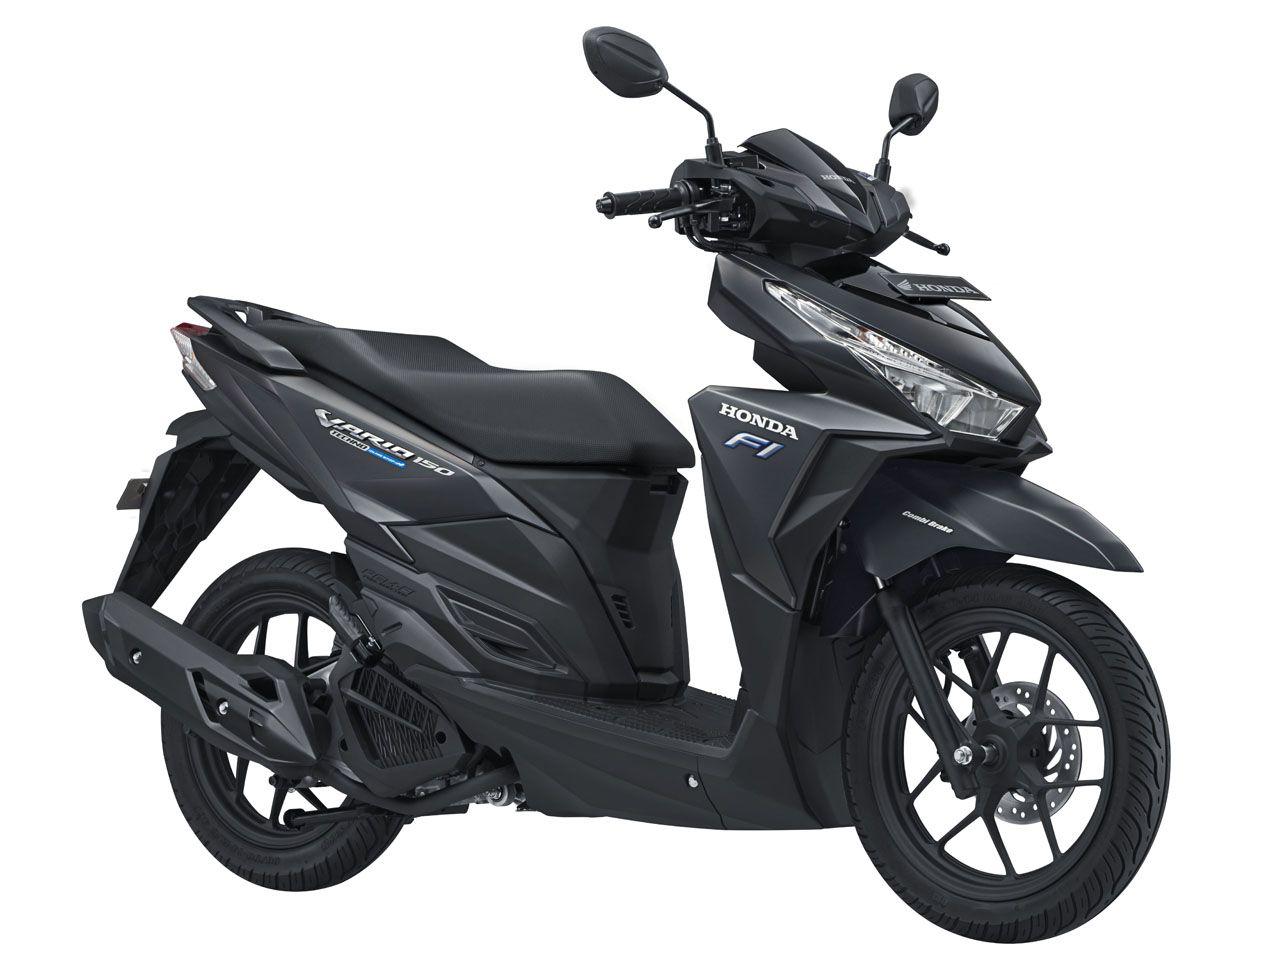 Harga Honda All New Vario Techno 150 di kota Medan . . . untuk bulan Februari 2015